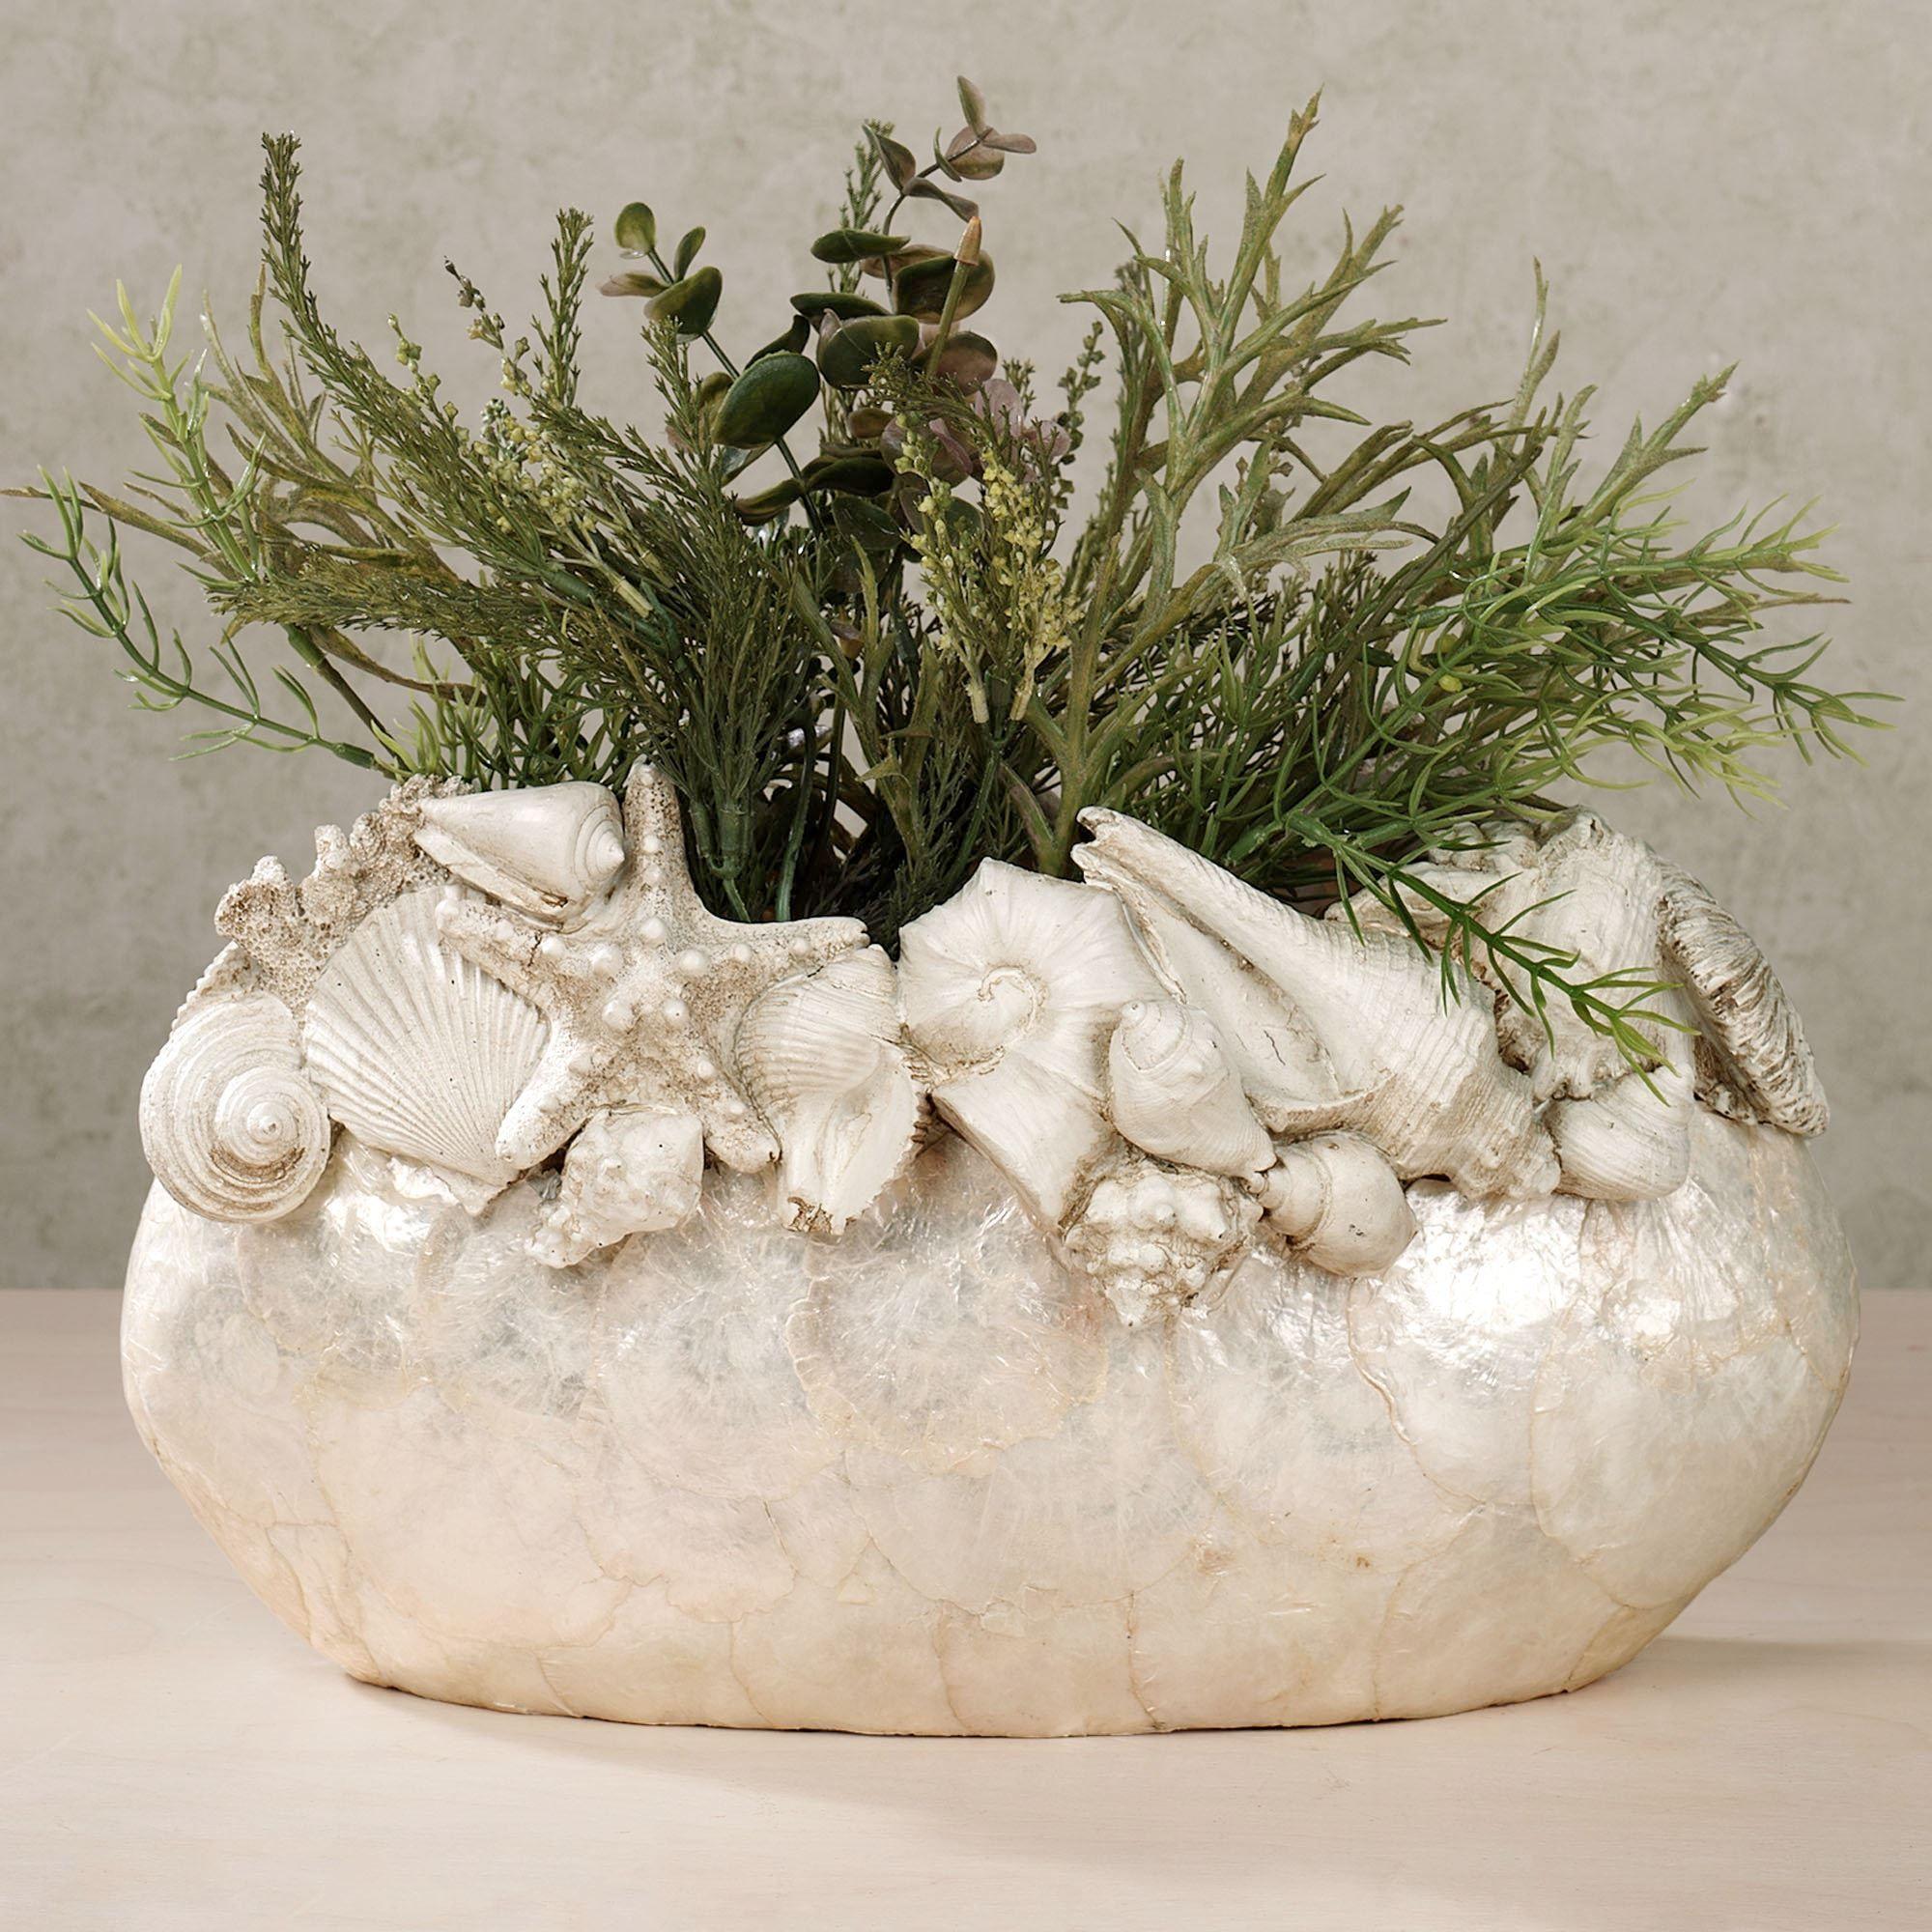 Seashell island capiz shell decorative vase seashell island vase ivory click to expand reviewsmspy